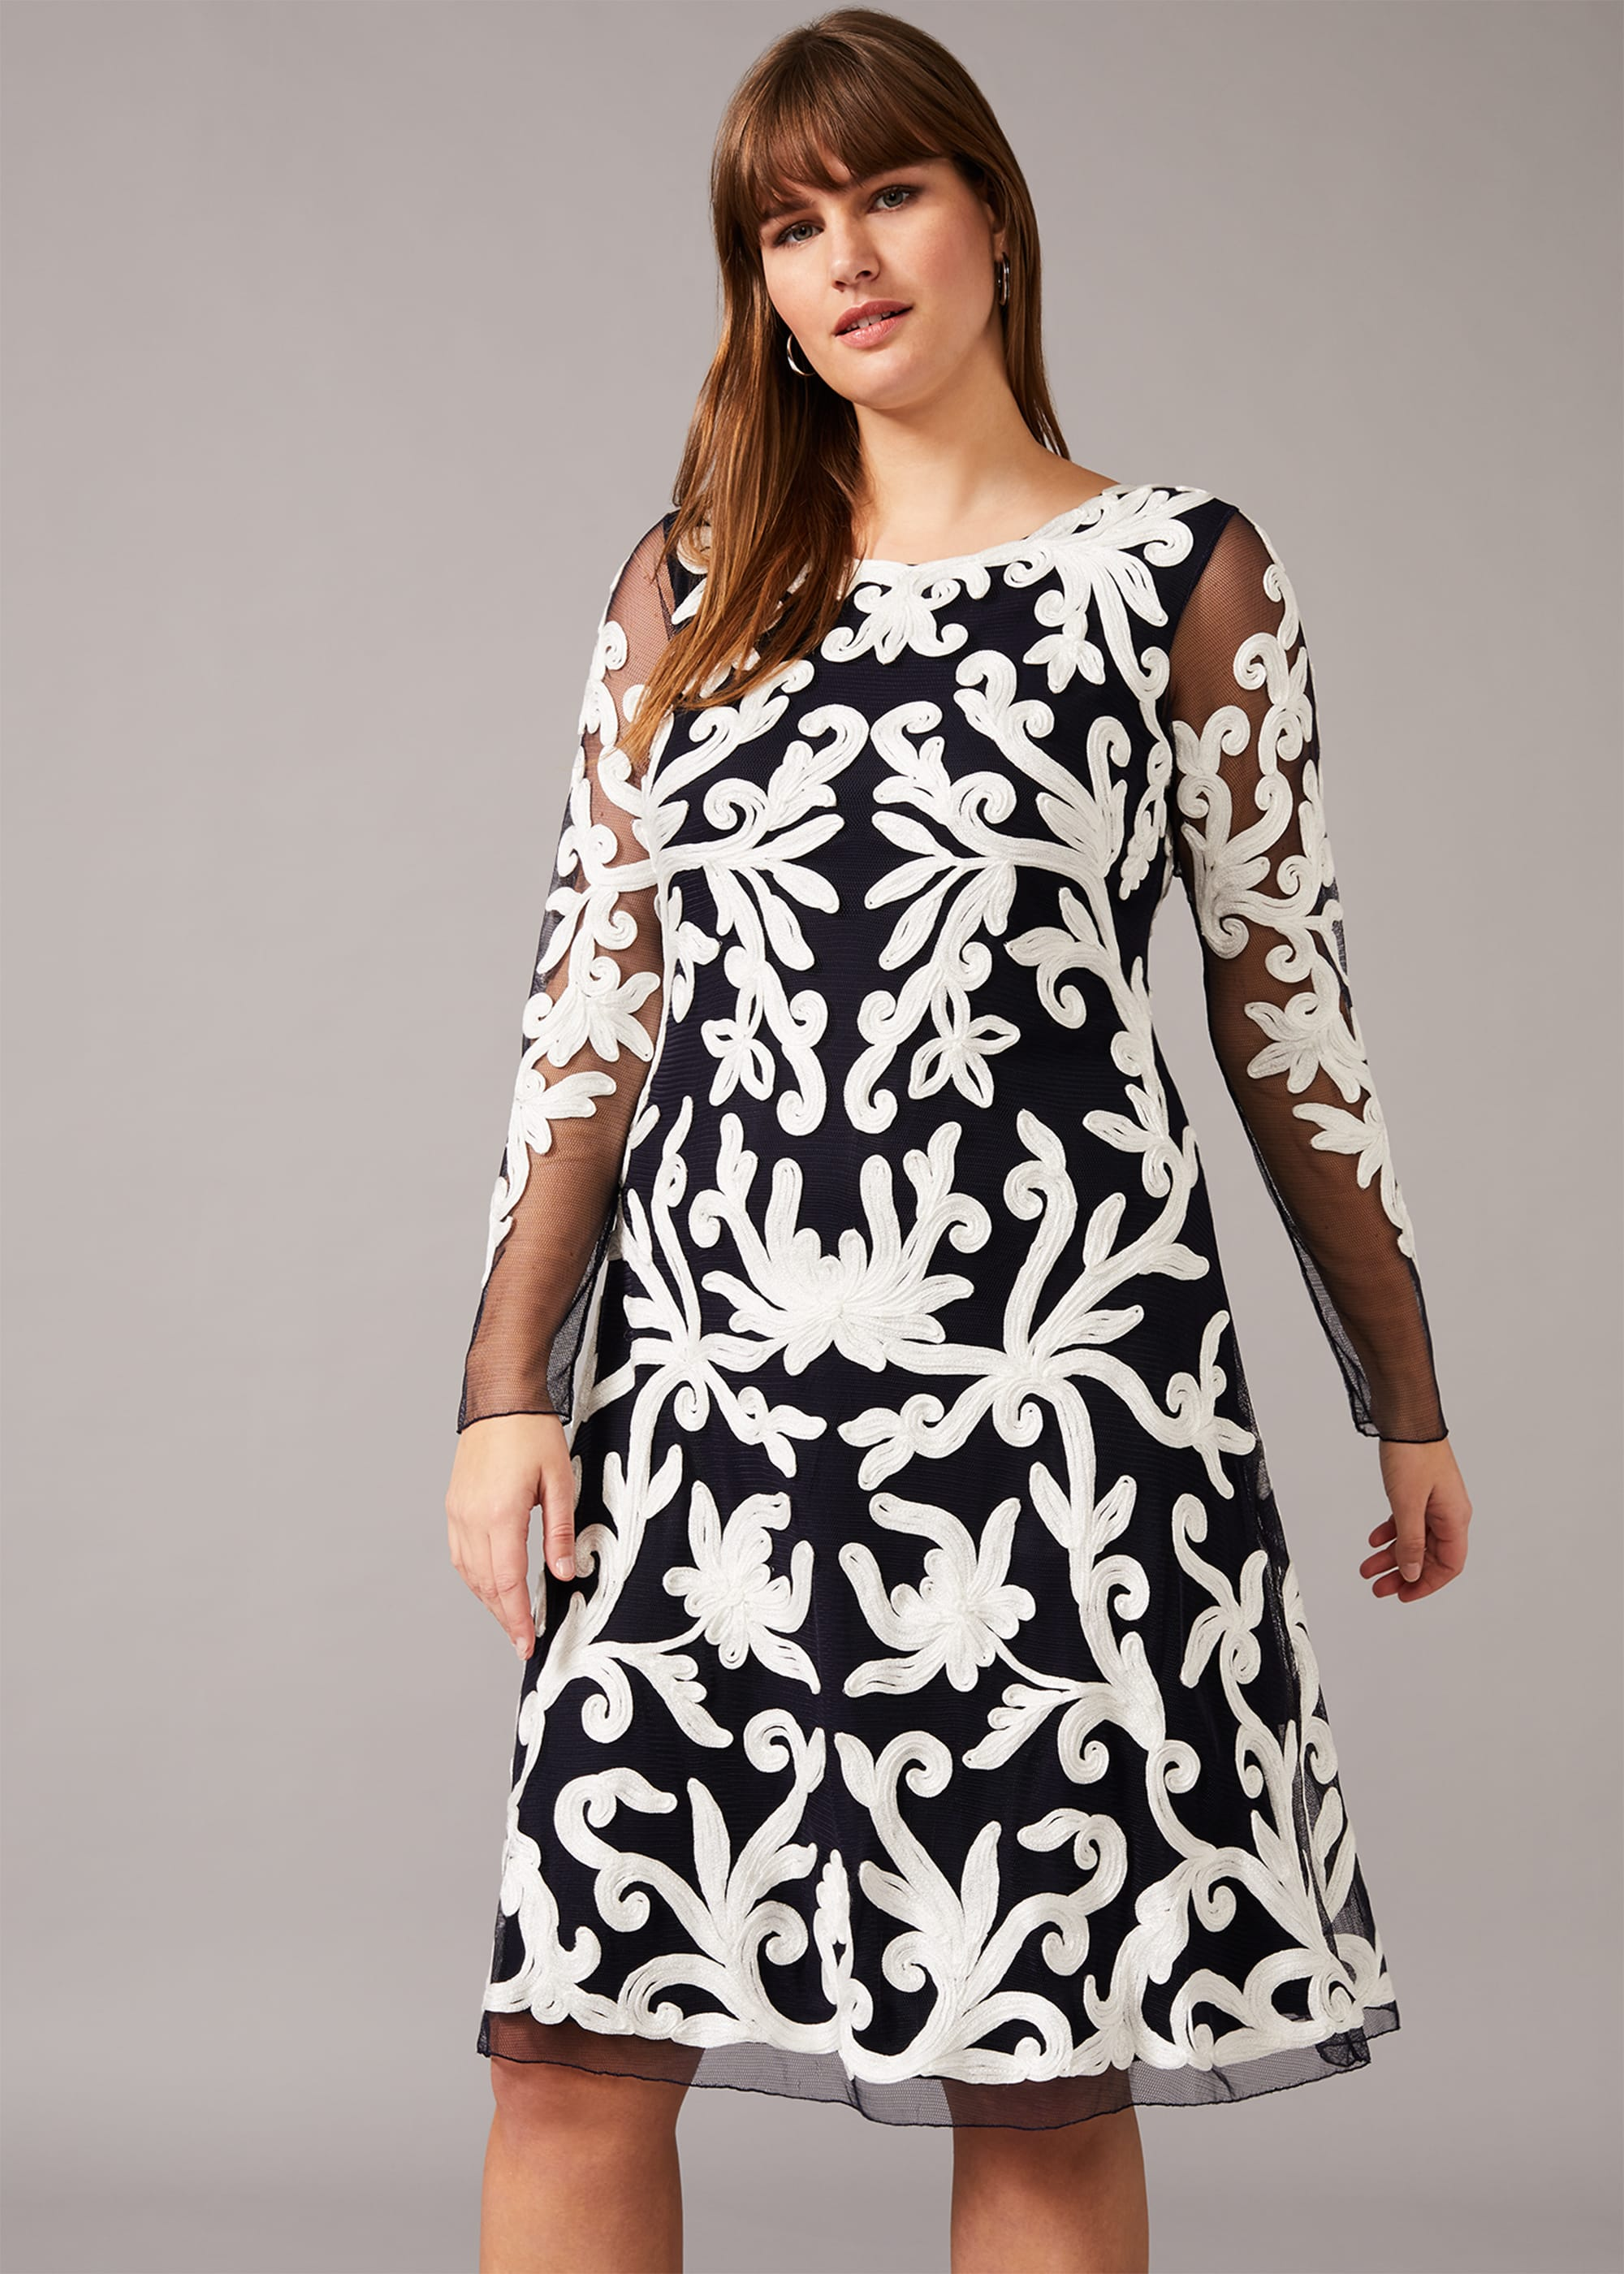 Studio 8 Women Aimee Tapework Lace Dress